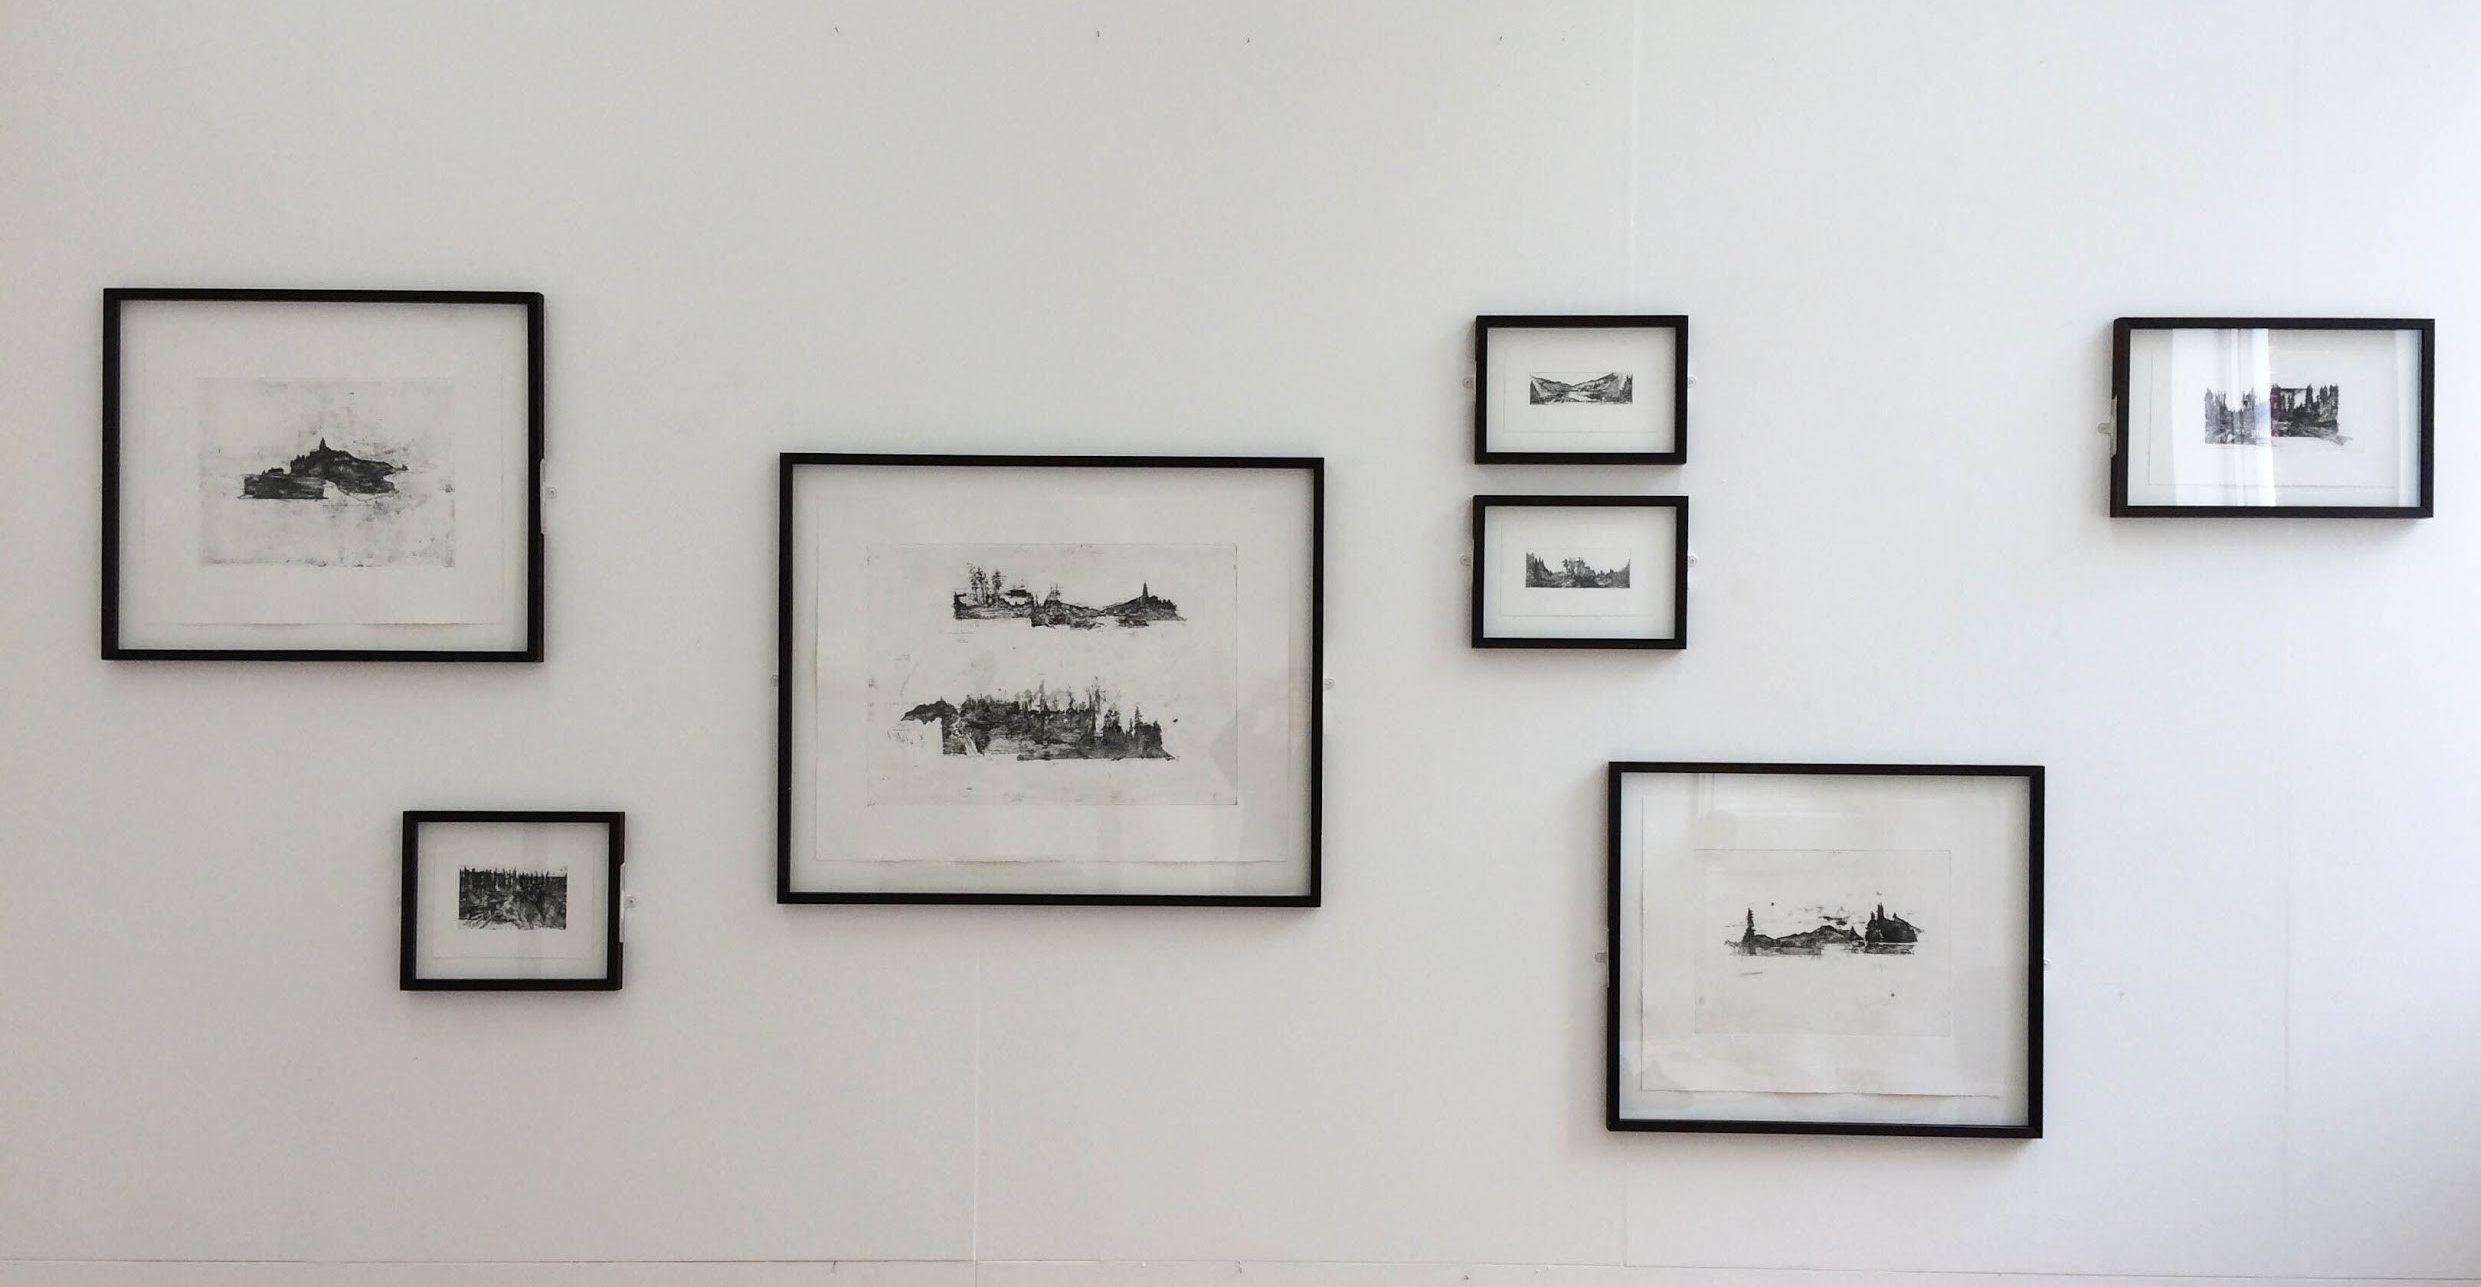 Minami's work on display